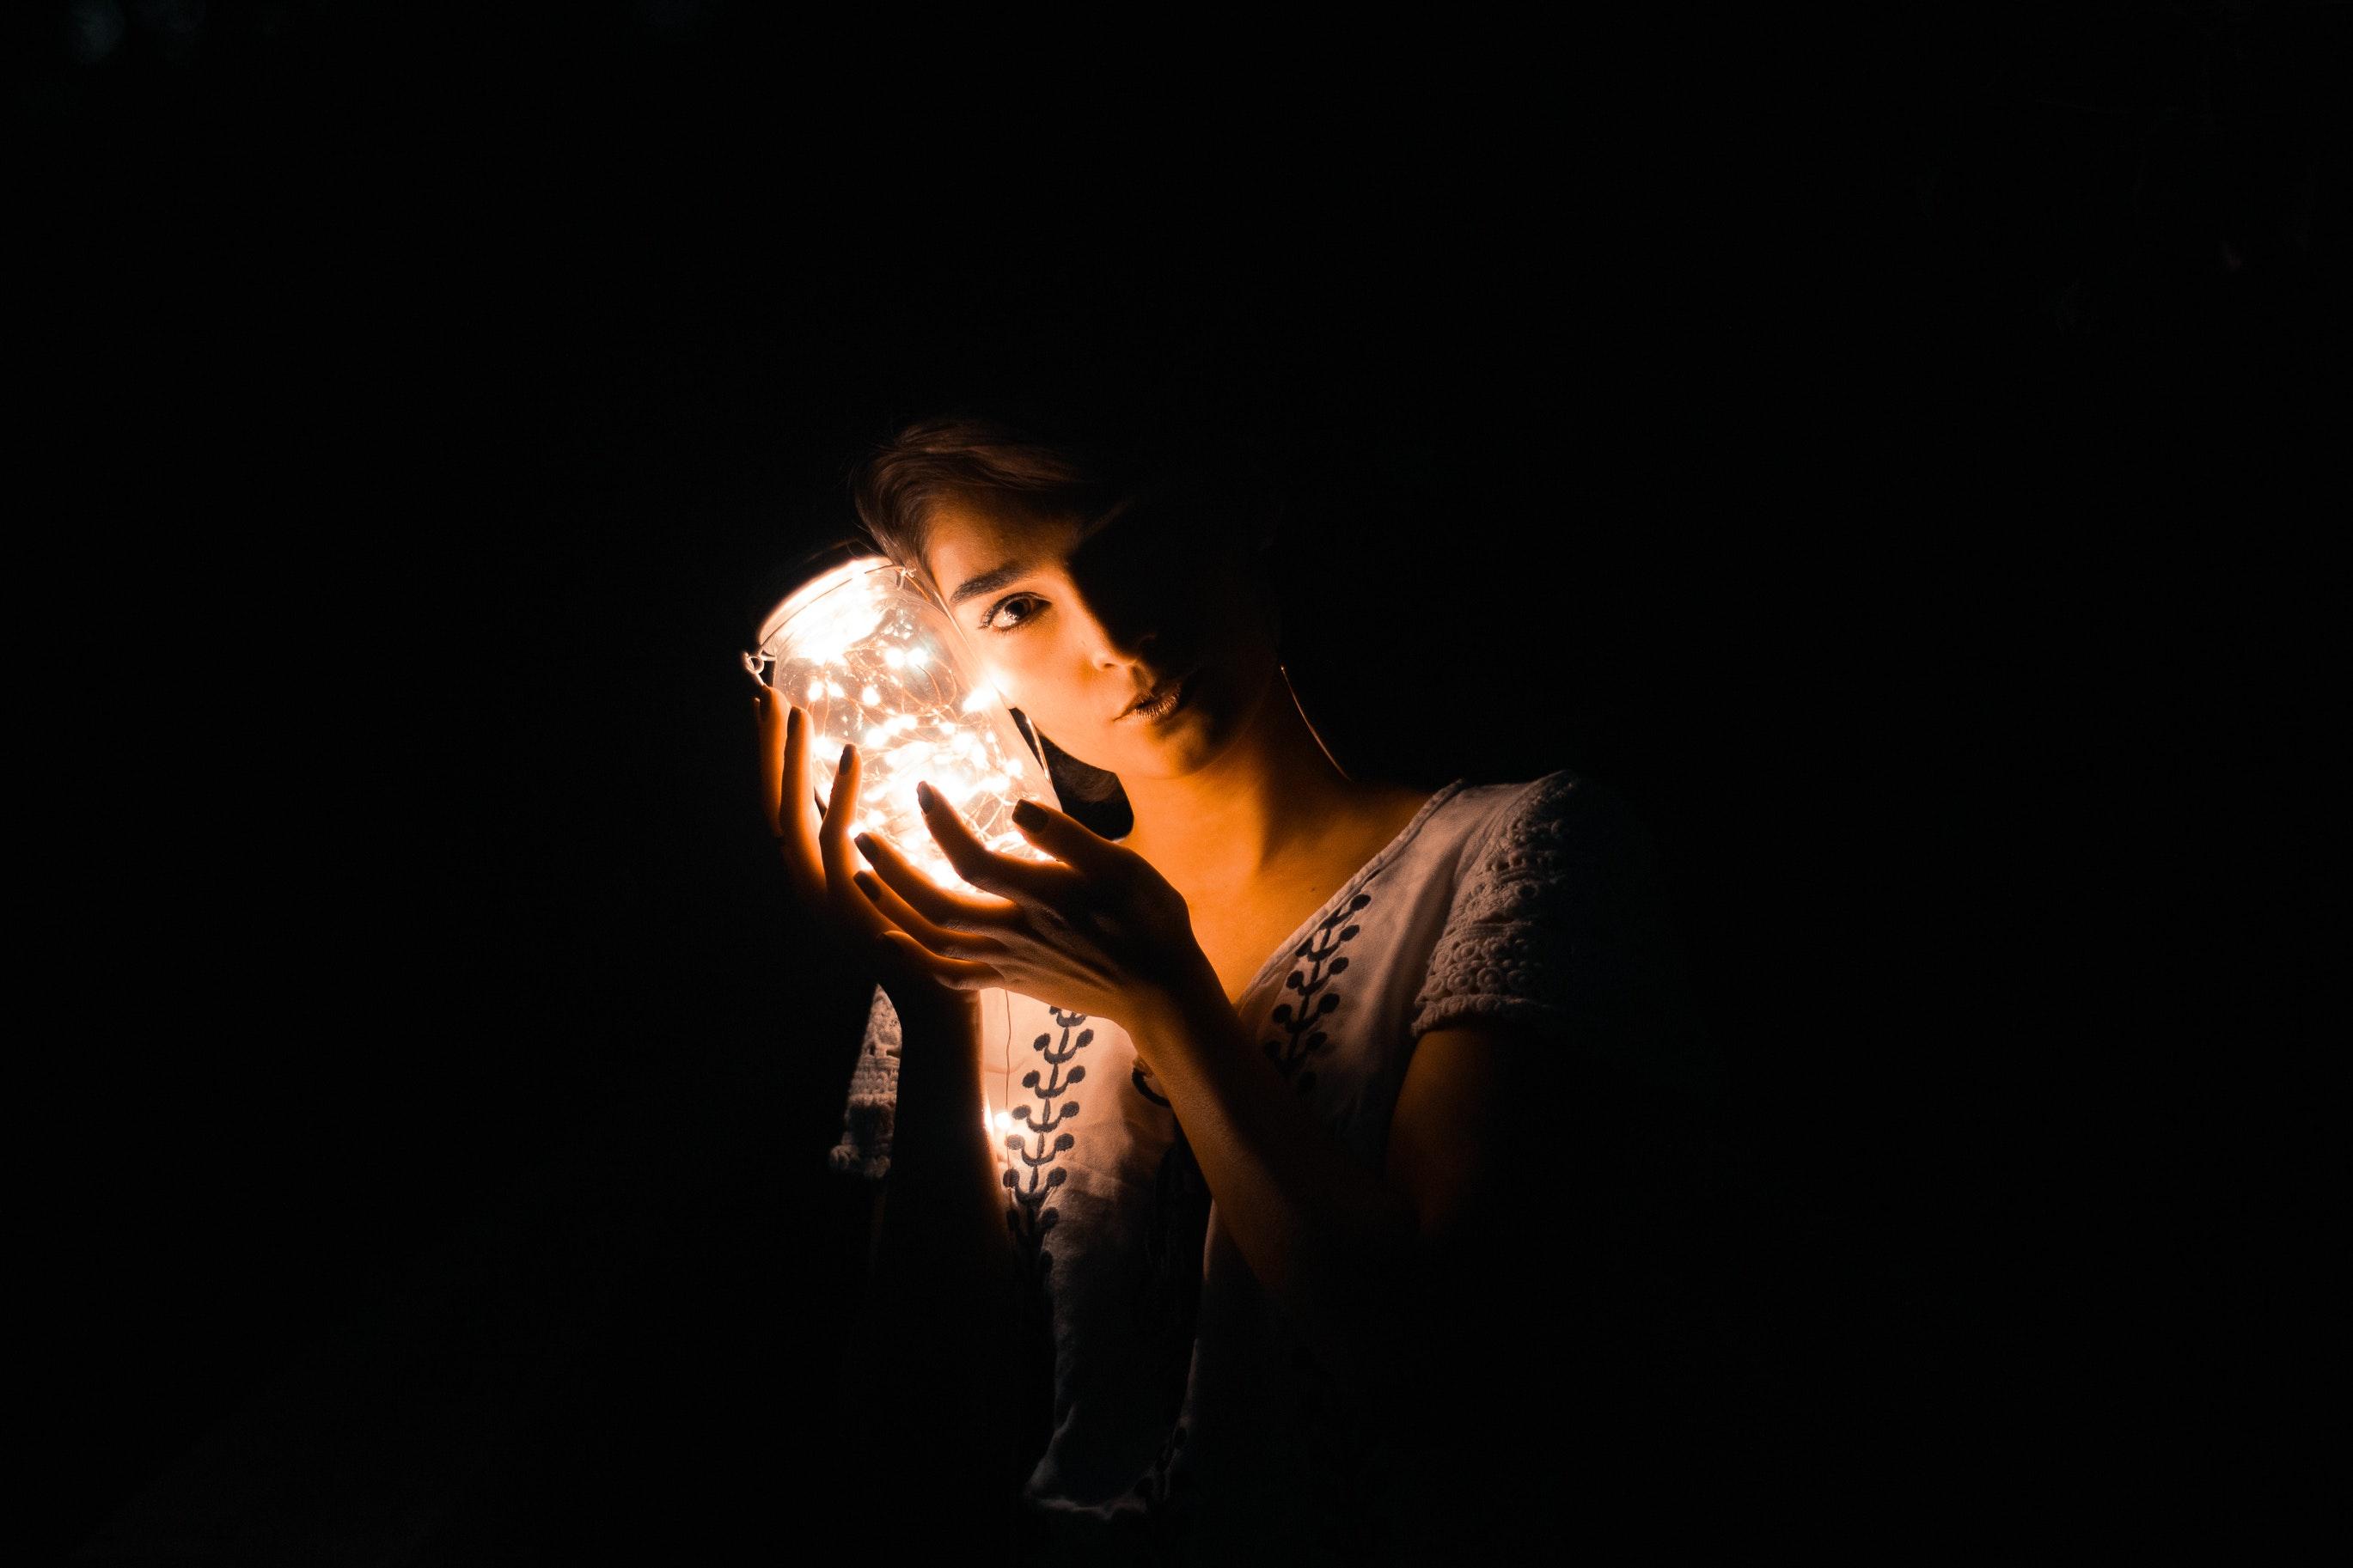 Beautiful Dark Face Female Hands Holding Jar Light Model Person Photoshoot Portrait Pose Y String